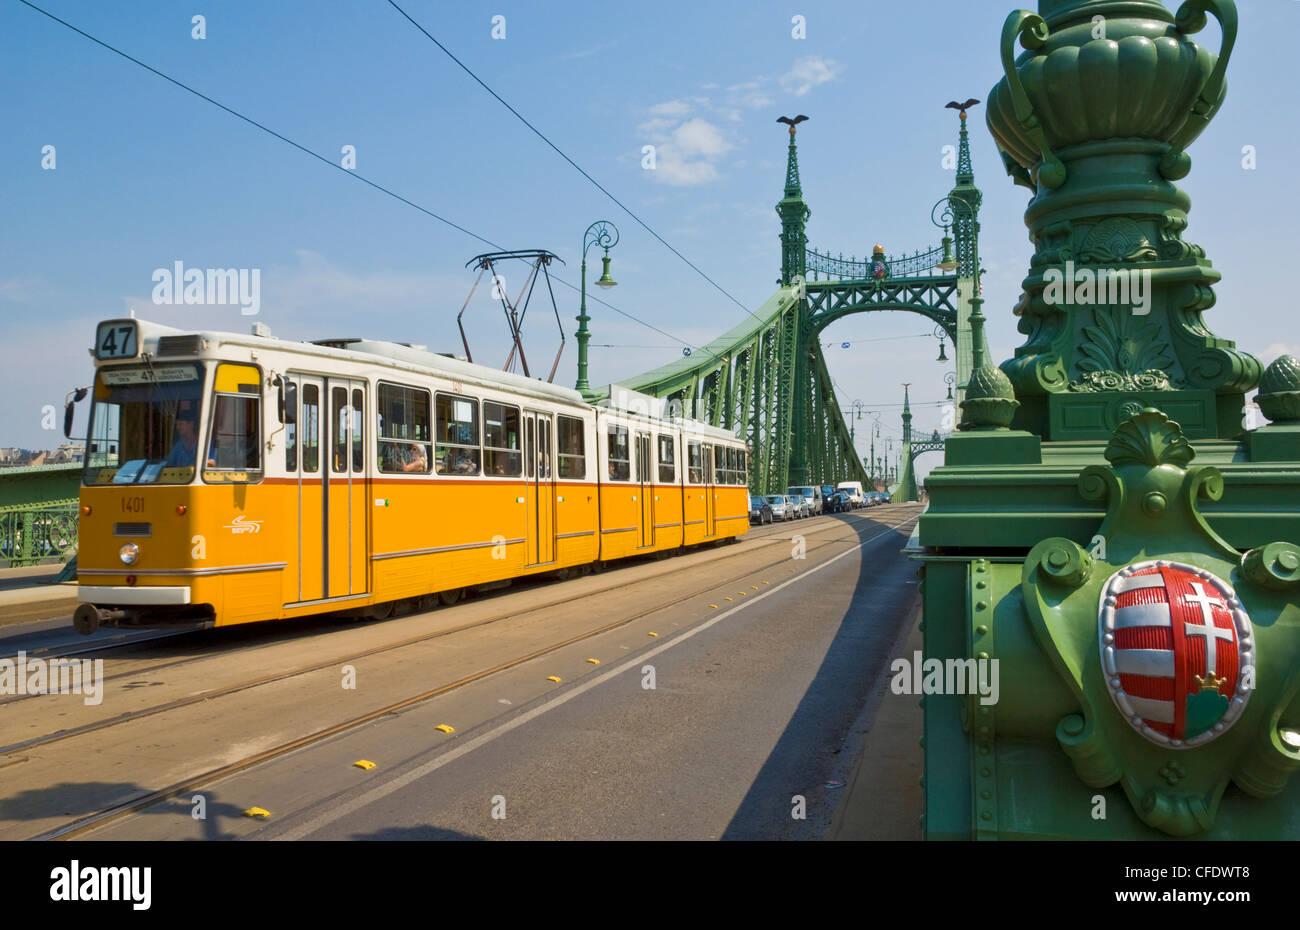 Yellow tram on The Liberty Bridge (Szabadsag hid), over the Rver Danube, Vamhaz Korut street, Budapest, Hungary, - Stock Image